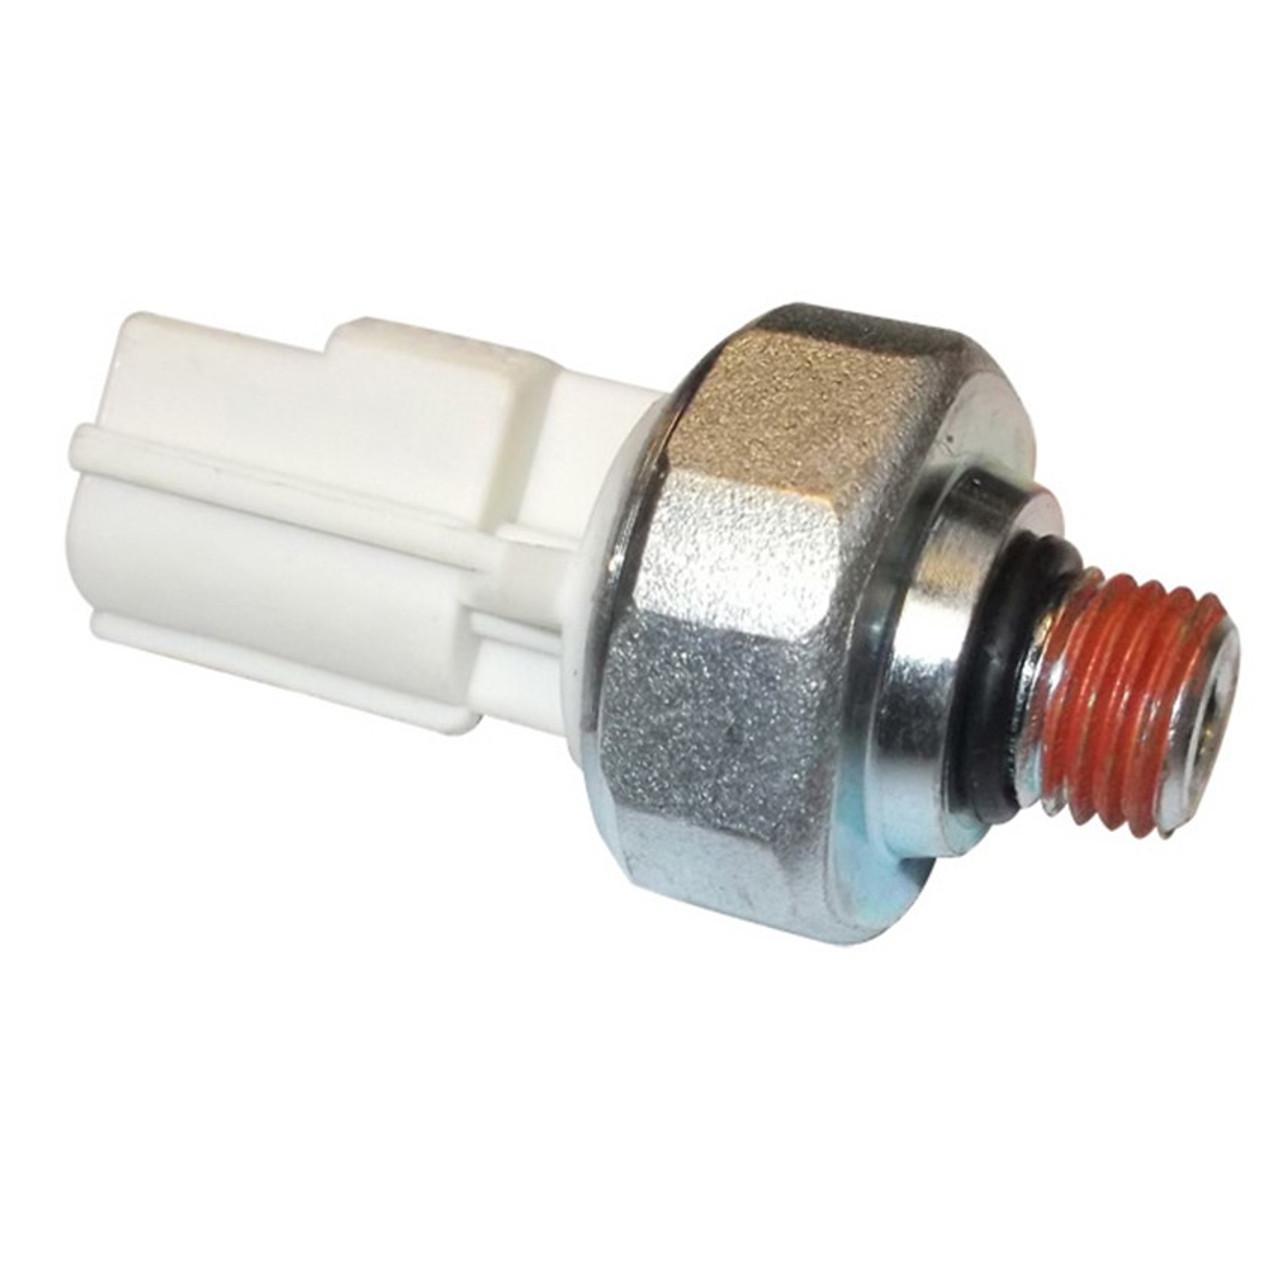 Ford Oil Pressure Sensor | BTS021259